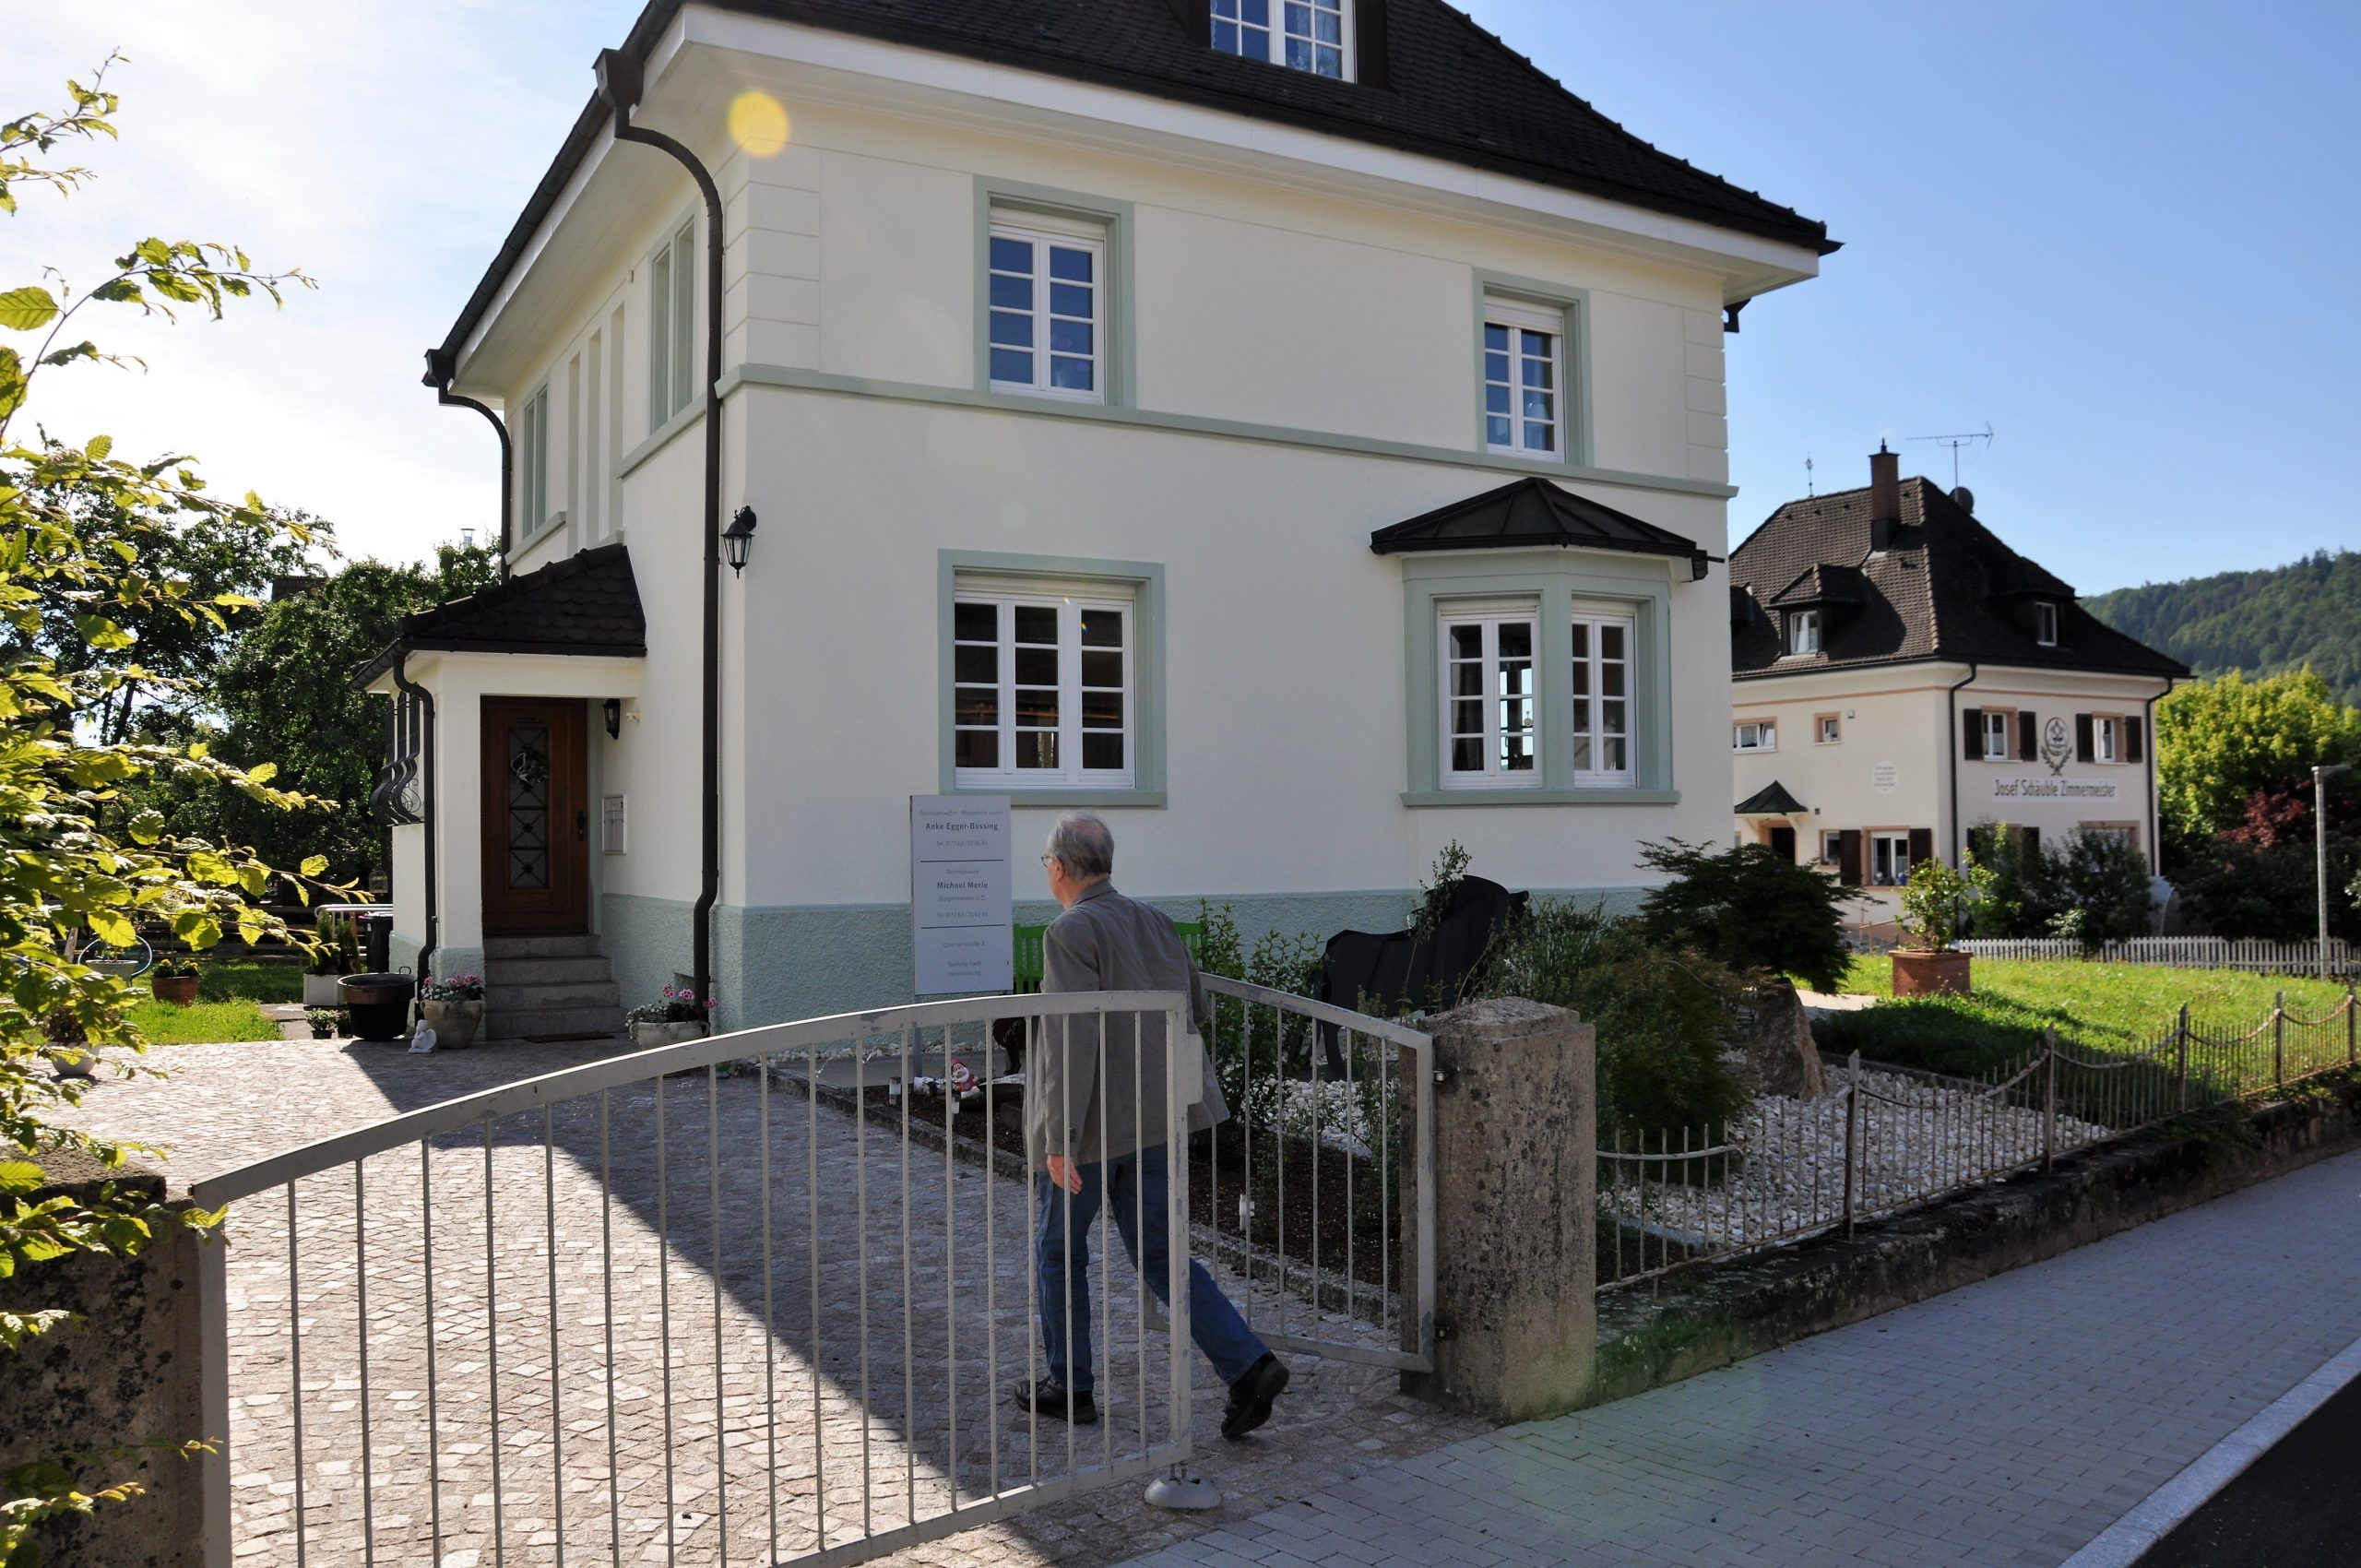 Kanzlei Laufenburg Anwalt Beratung